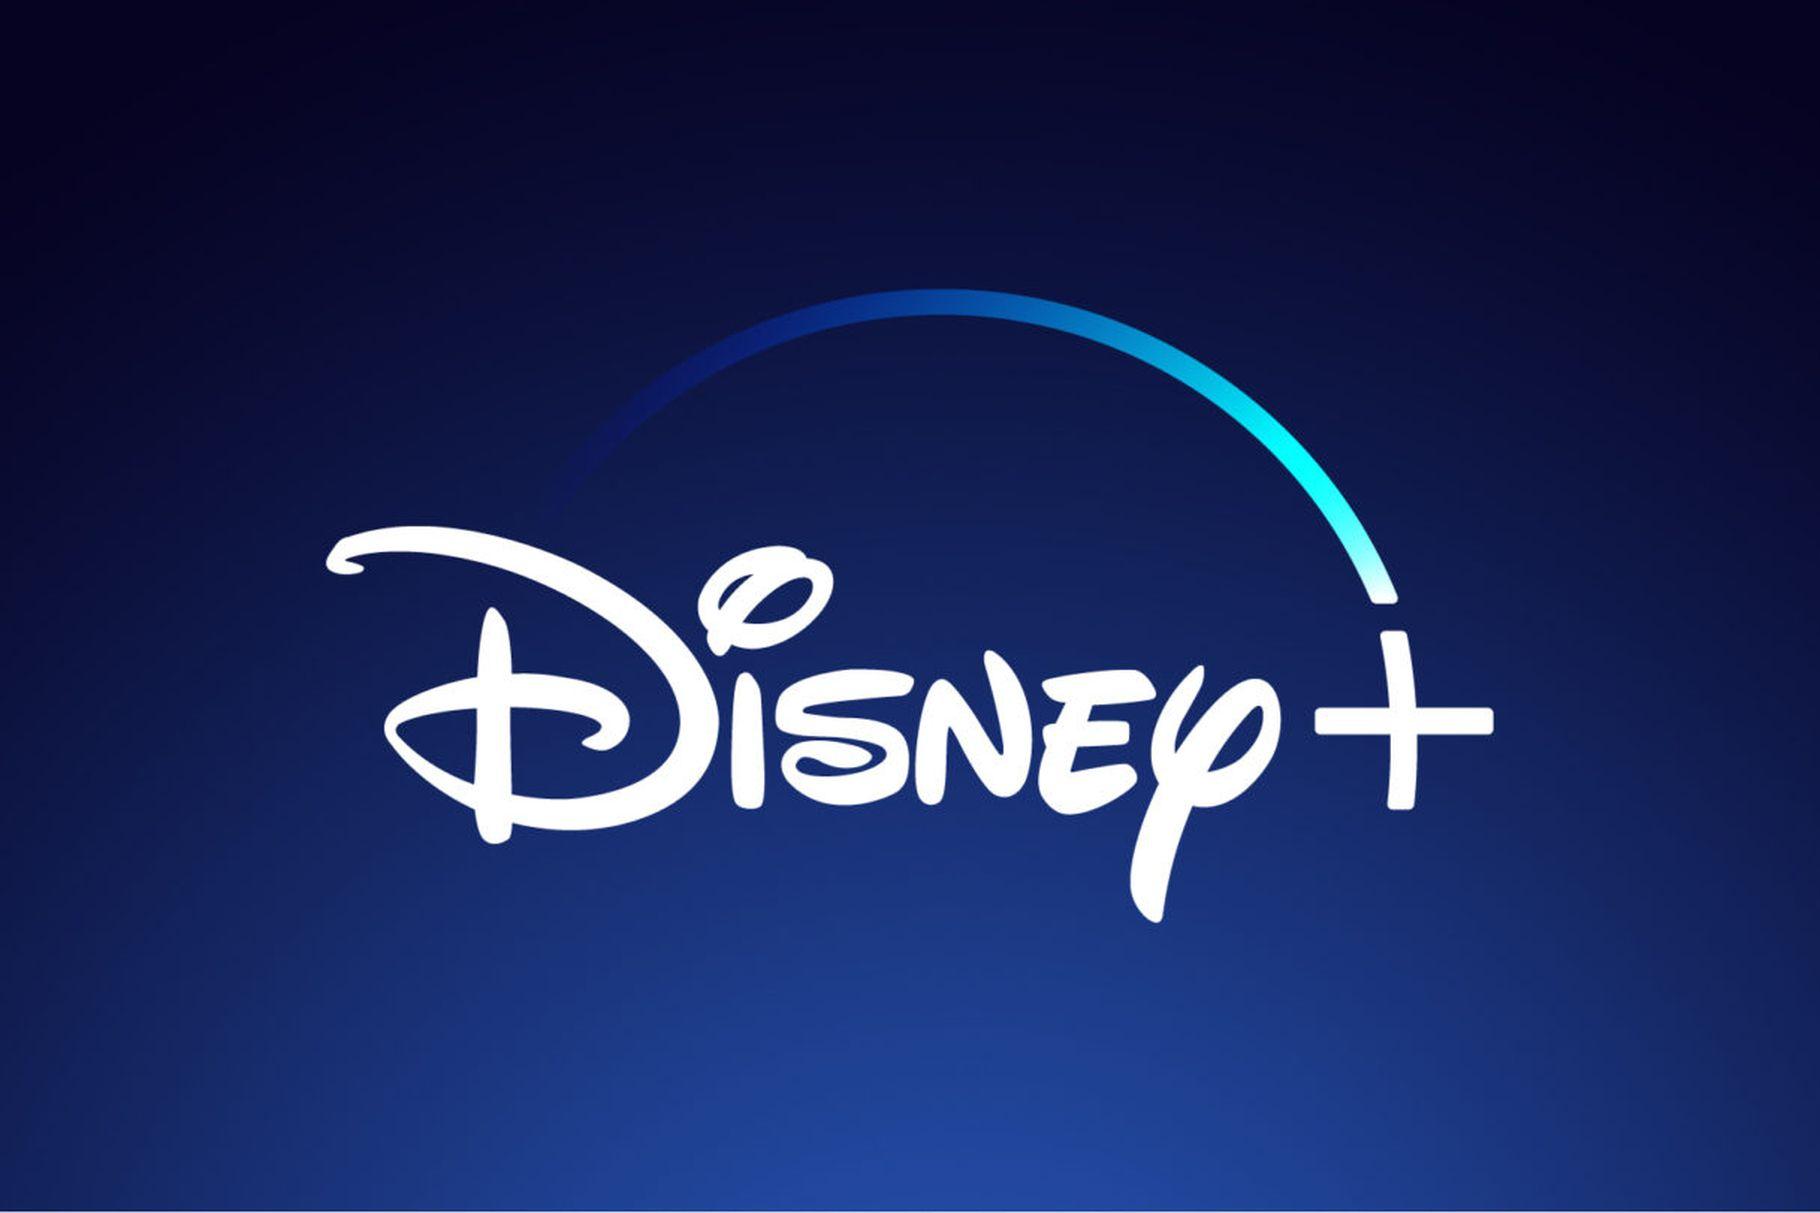 Announcing Disney+